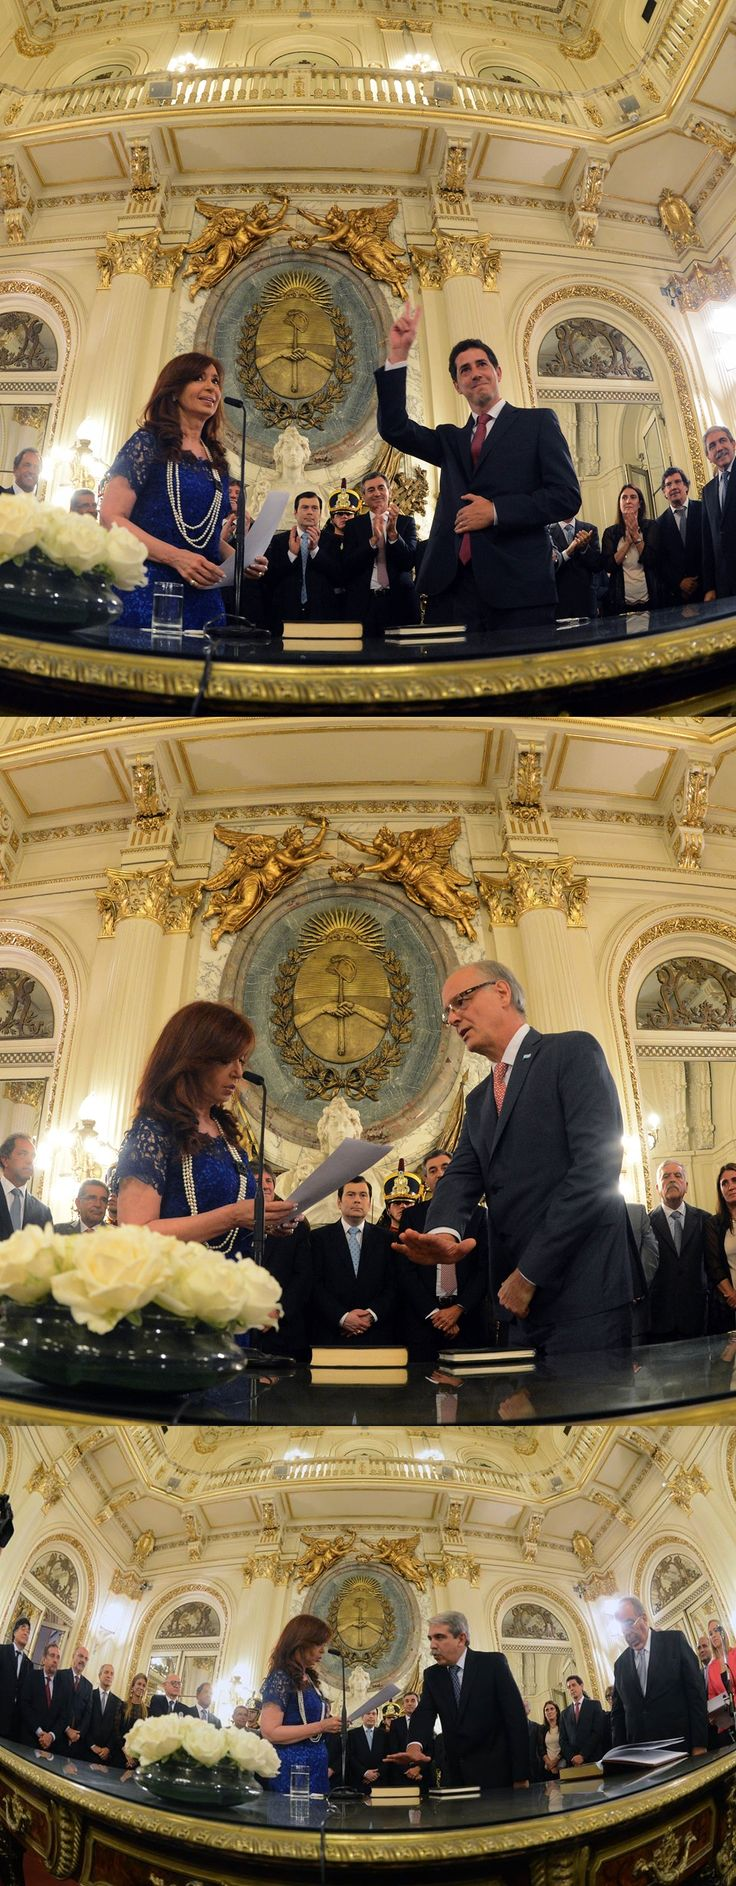 La presidenta Cristina Fernández de Kirchner toma juramento de asunción a Aníbal Fernandez como Jefe de Gabinete, a Eduardo de Pedro como Secretario General de la Presidencia, y a Daniel Gollán como Ministro de Salud.